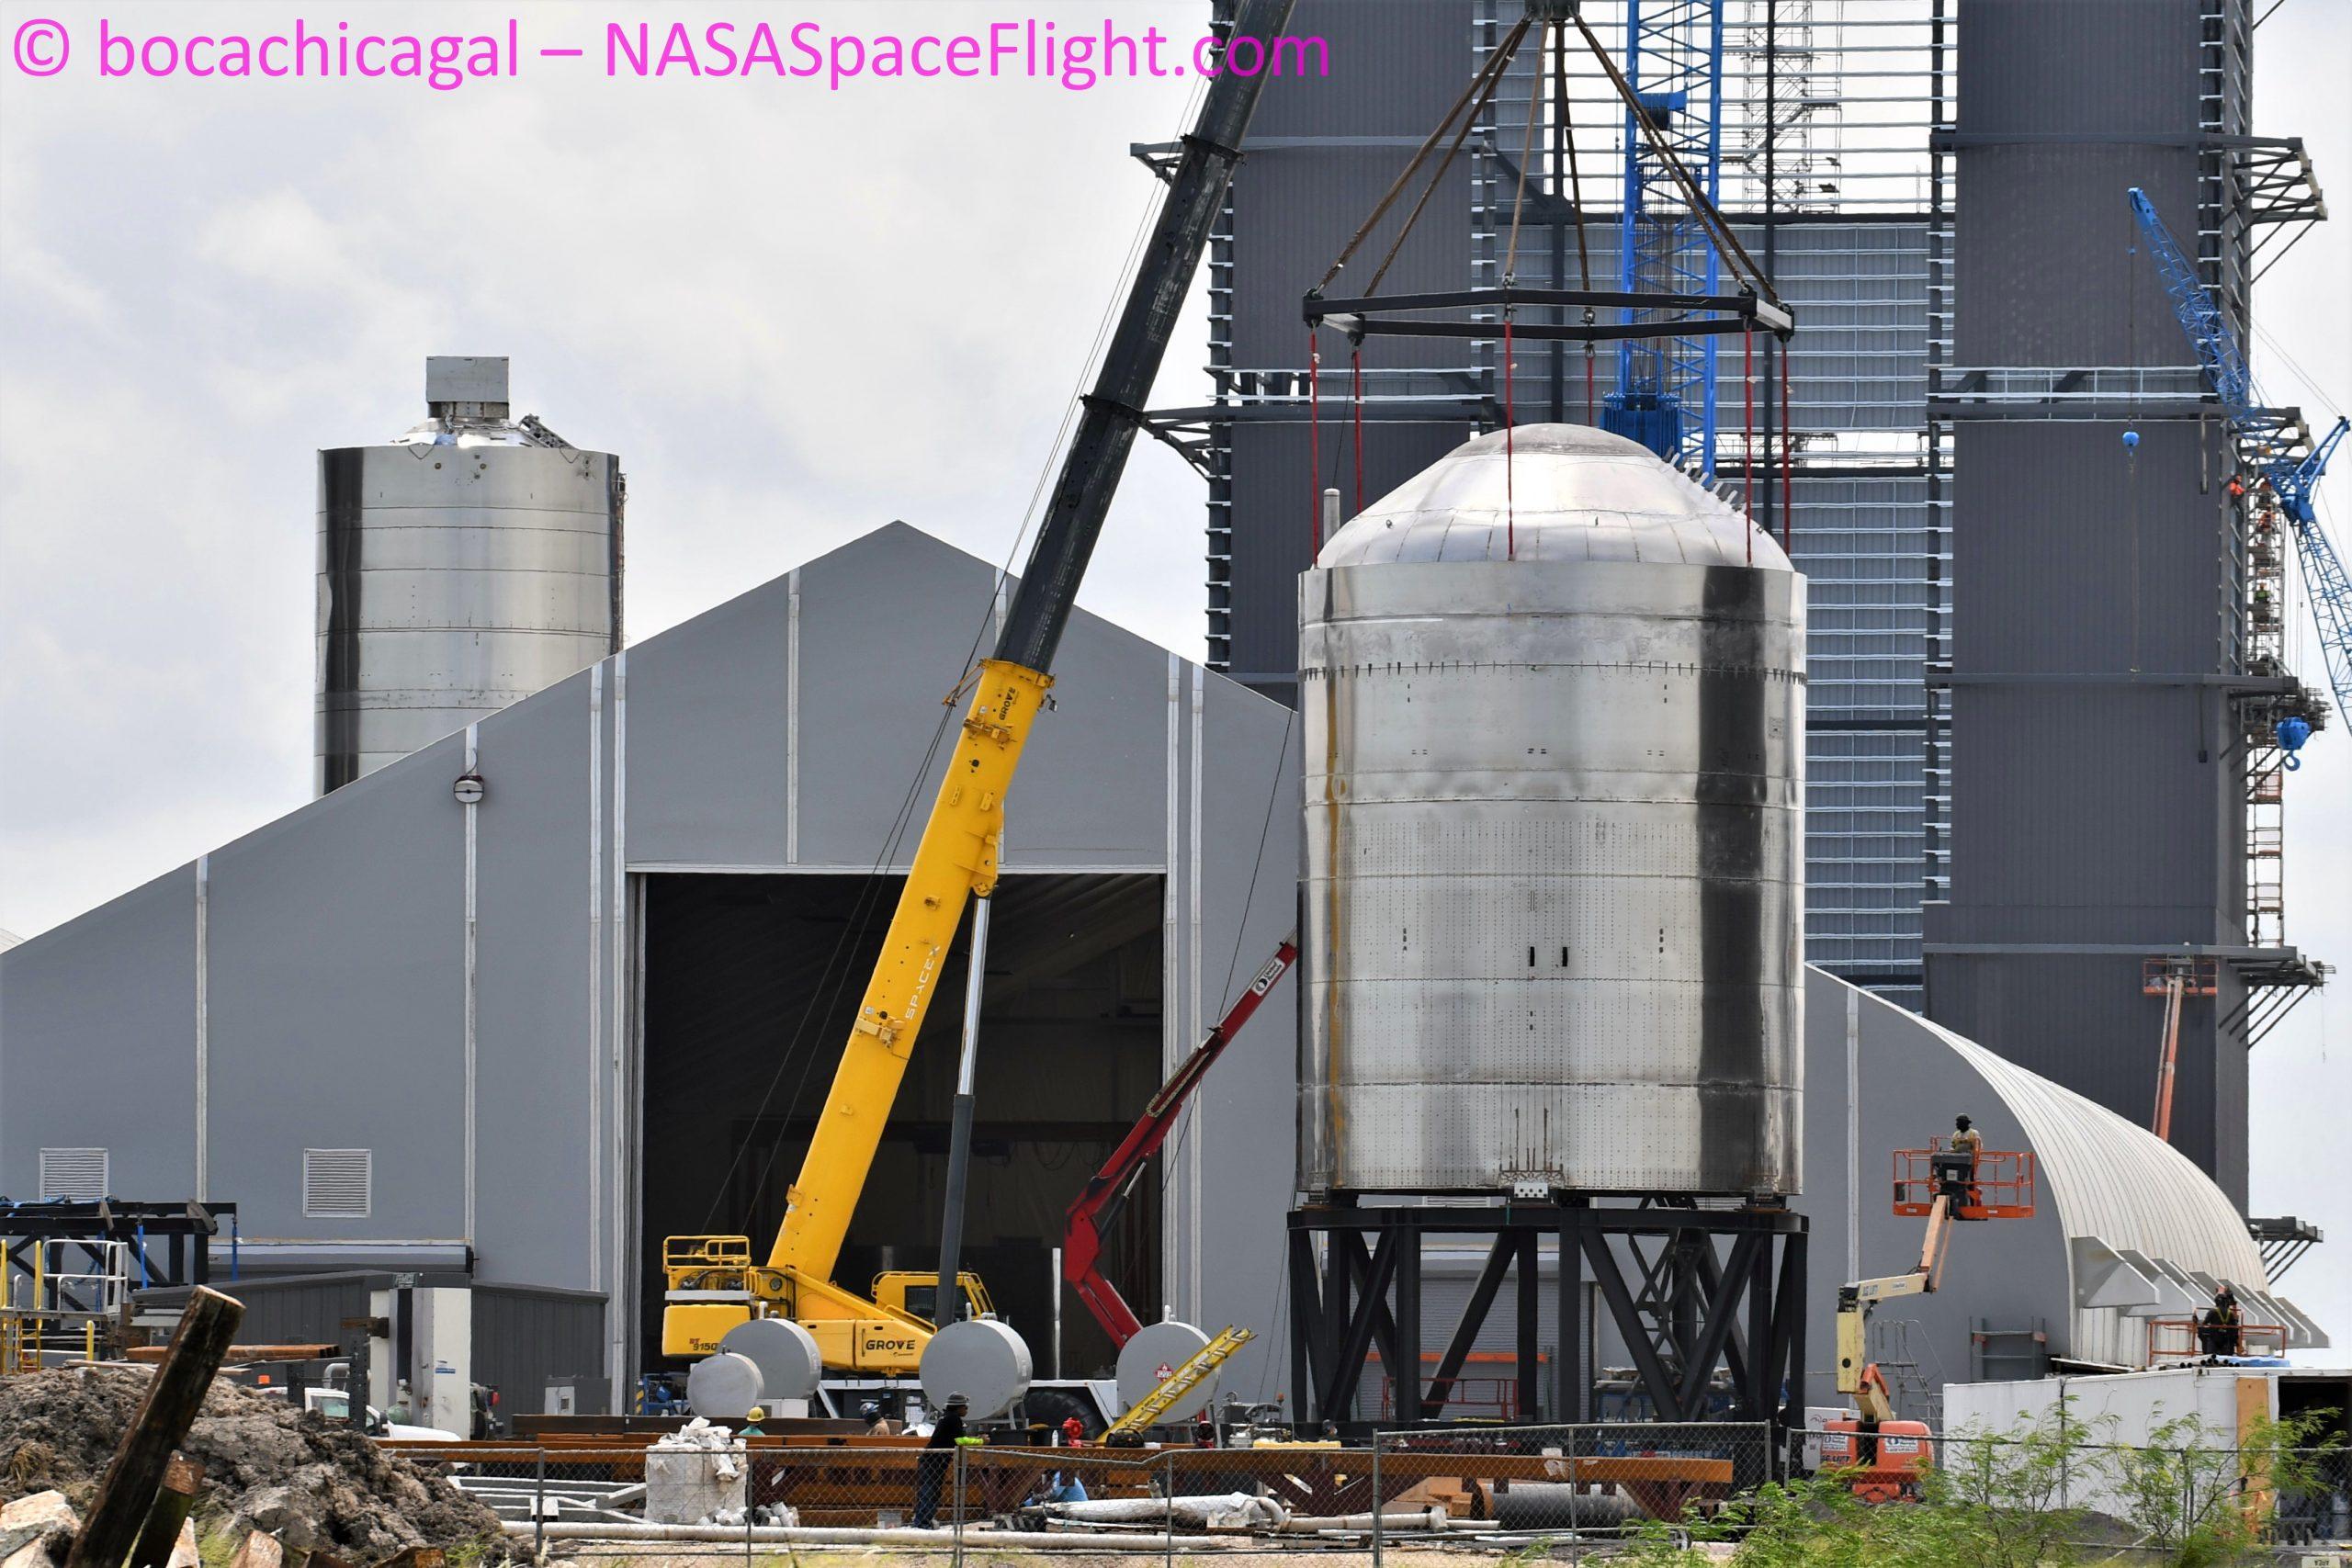 Starship Boca Chica 083020 (NASASpaceflight – bocachicagal) SN7.1 test tank 1